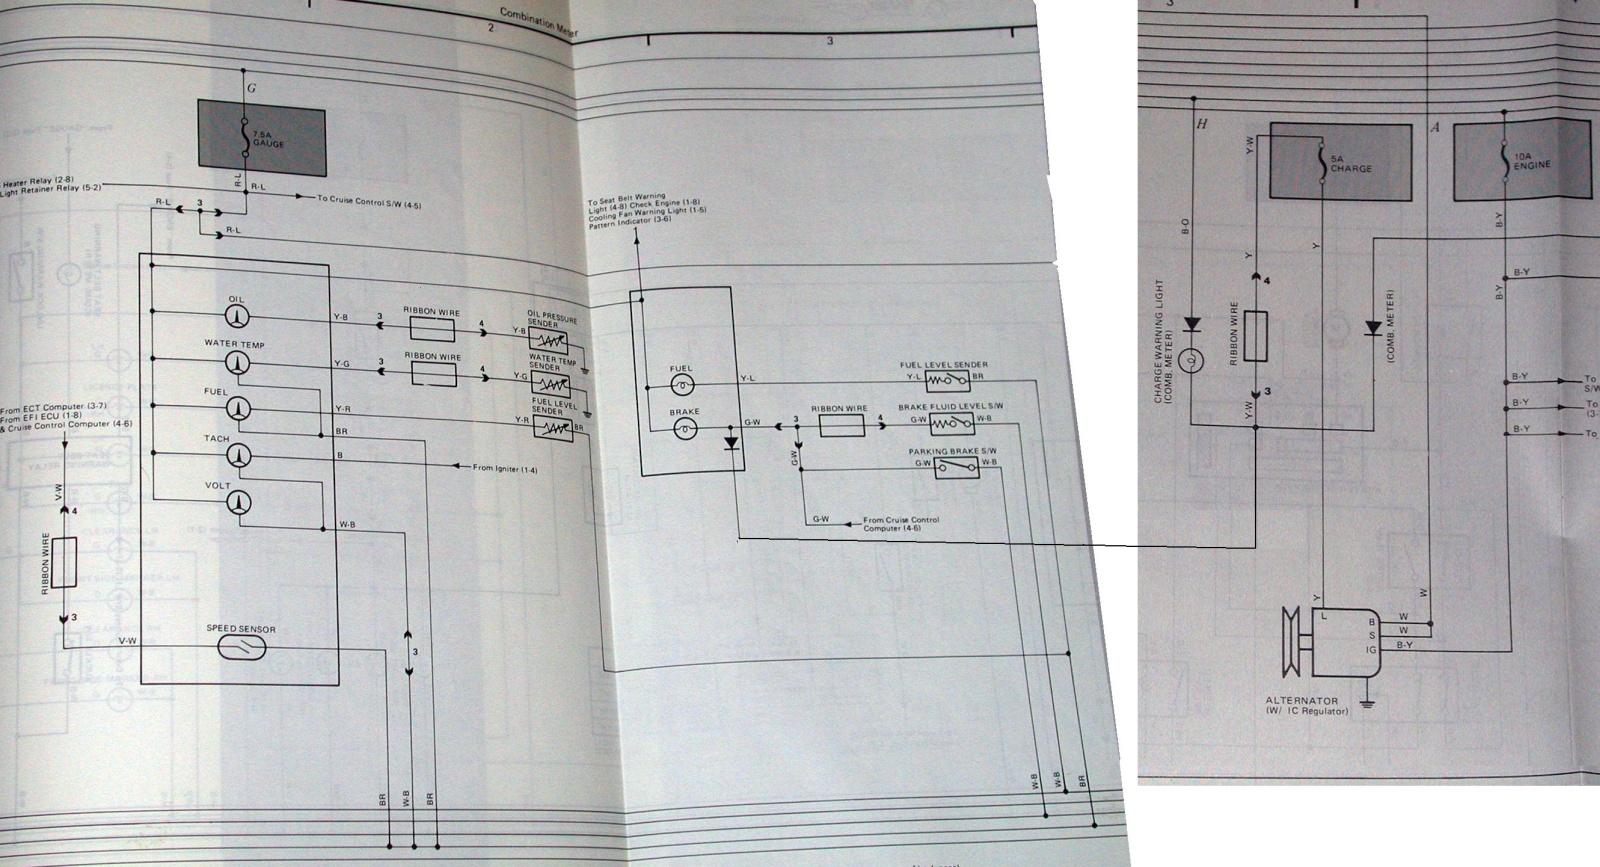 Am38227 Wiring Diagram John Deere Key Switch Free Wiring – John Deere 318 Ignition Switch Wiring Diagram